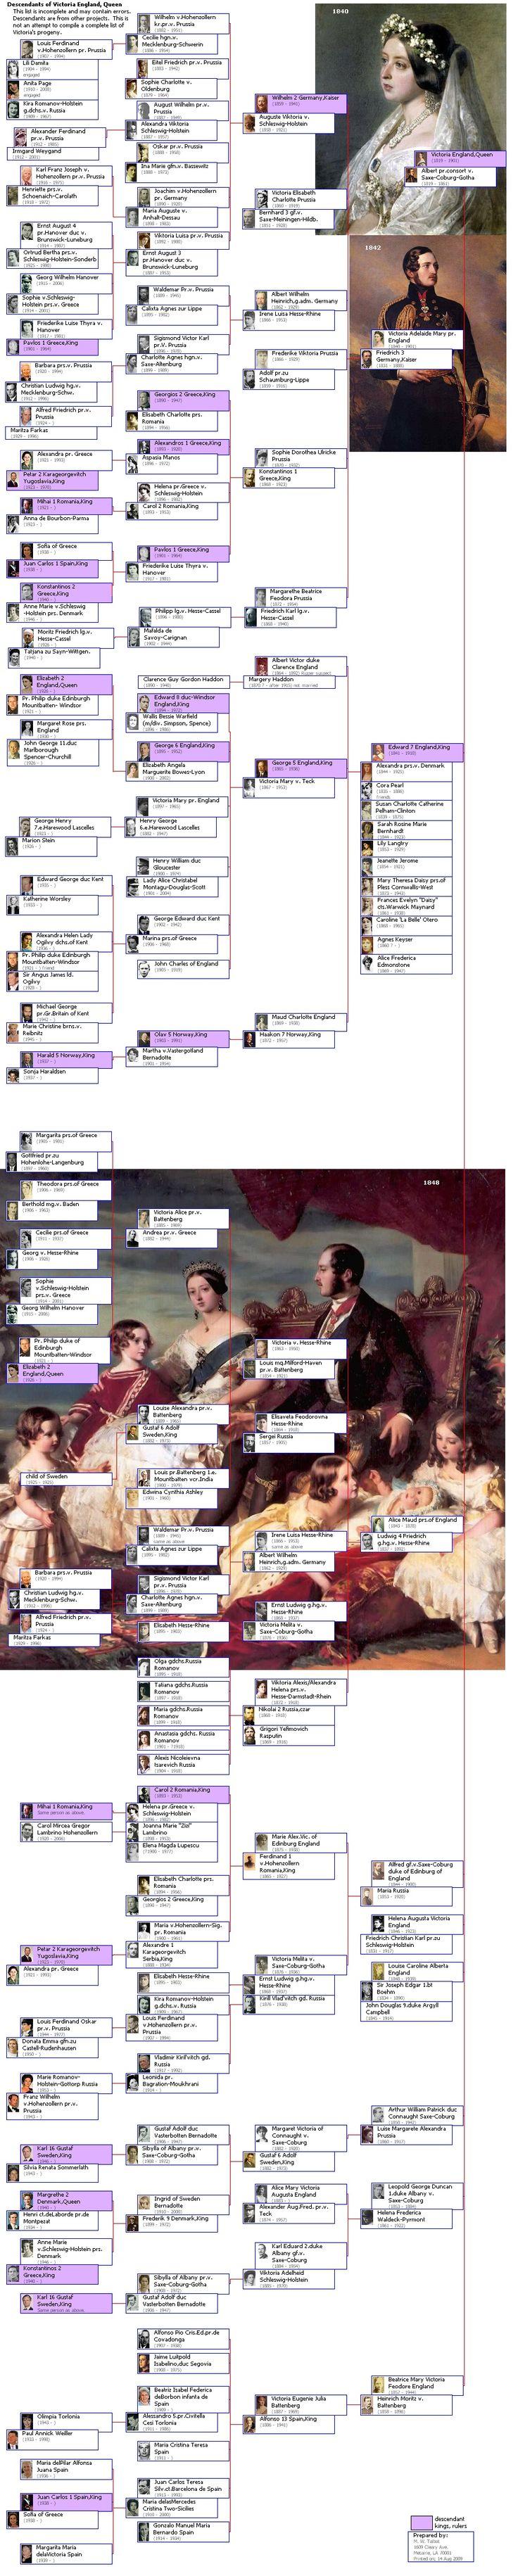 [Great Britain, whole Europe] Queen Victoria's Descendants